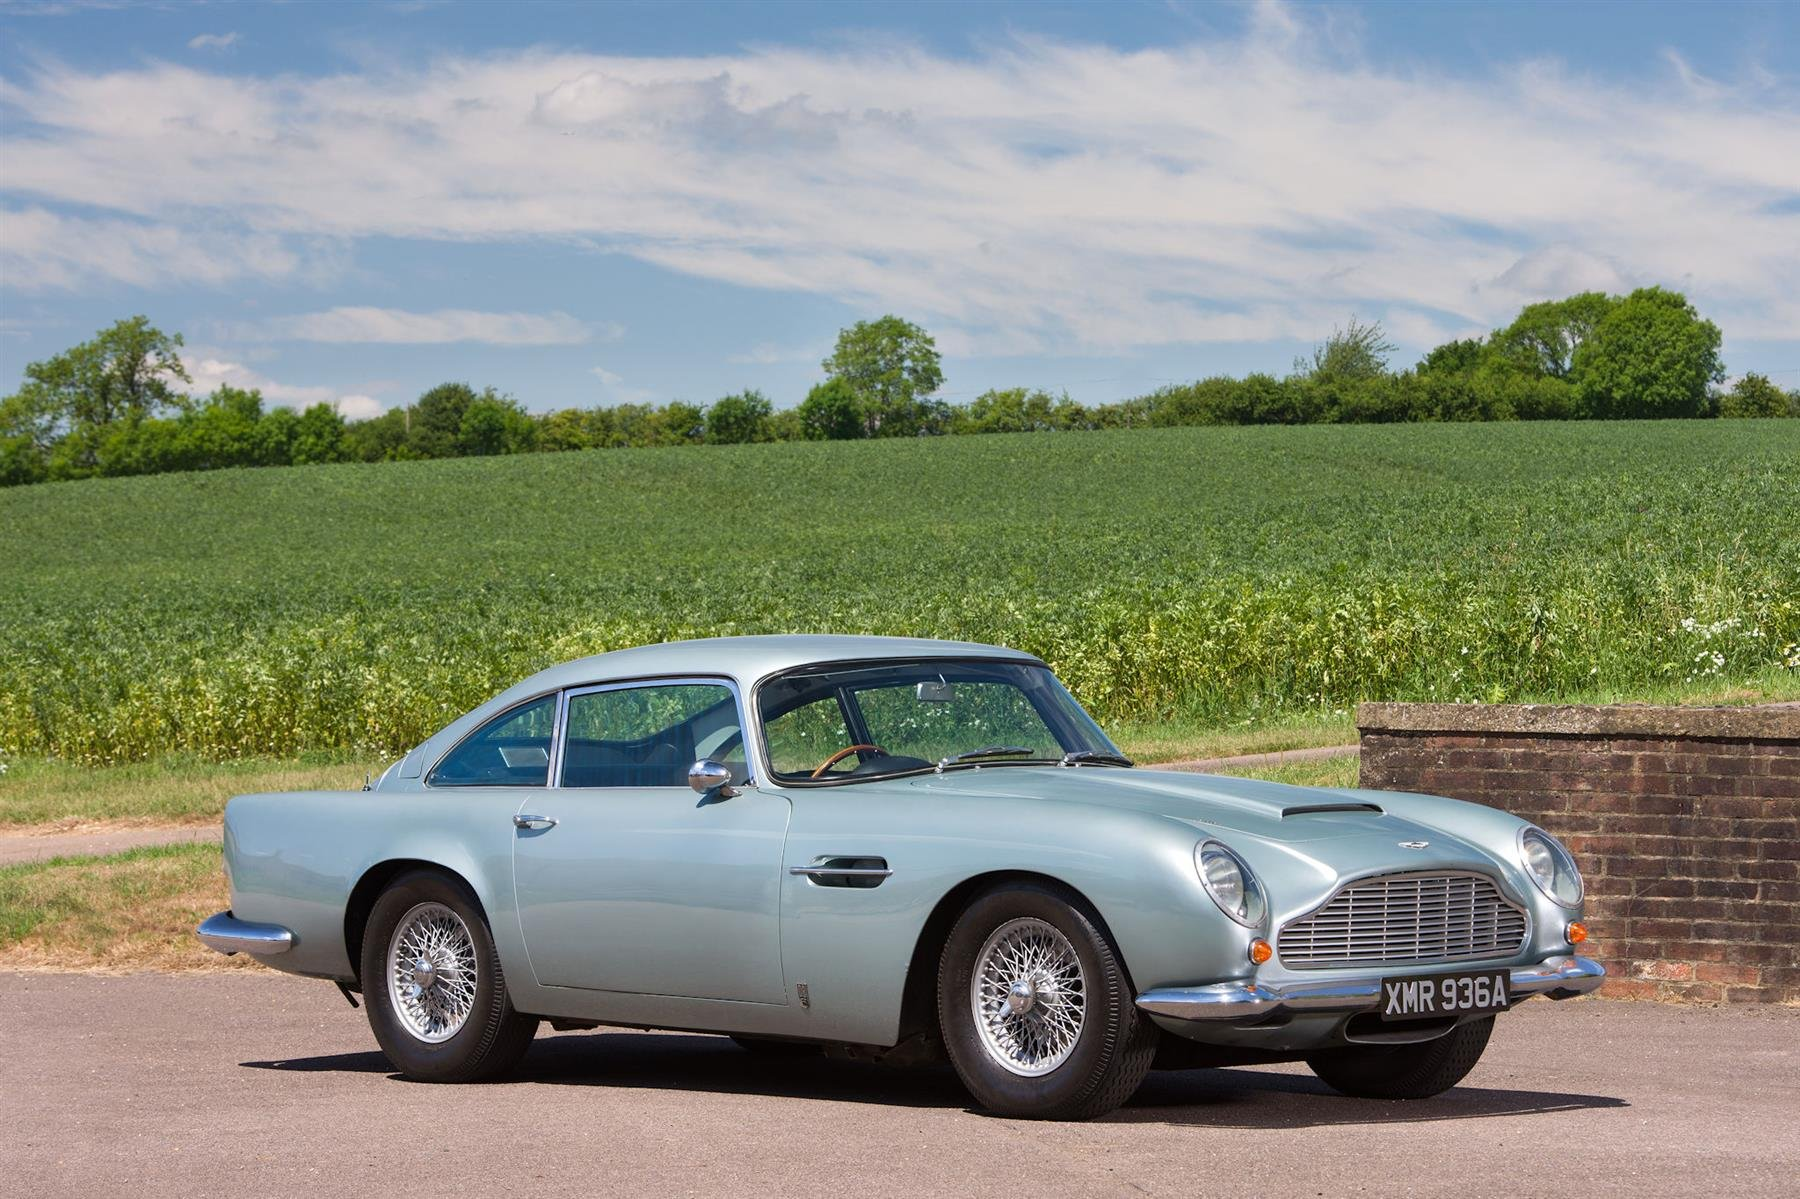 1963 aston martin db5 for sale #33954 | motorious